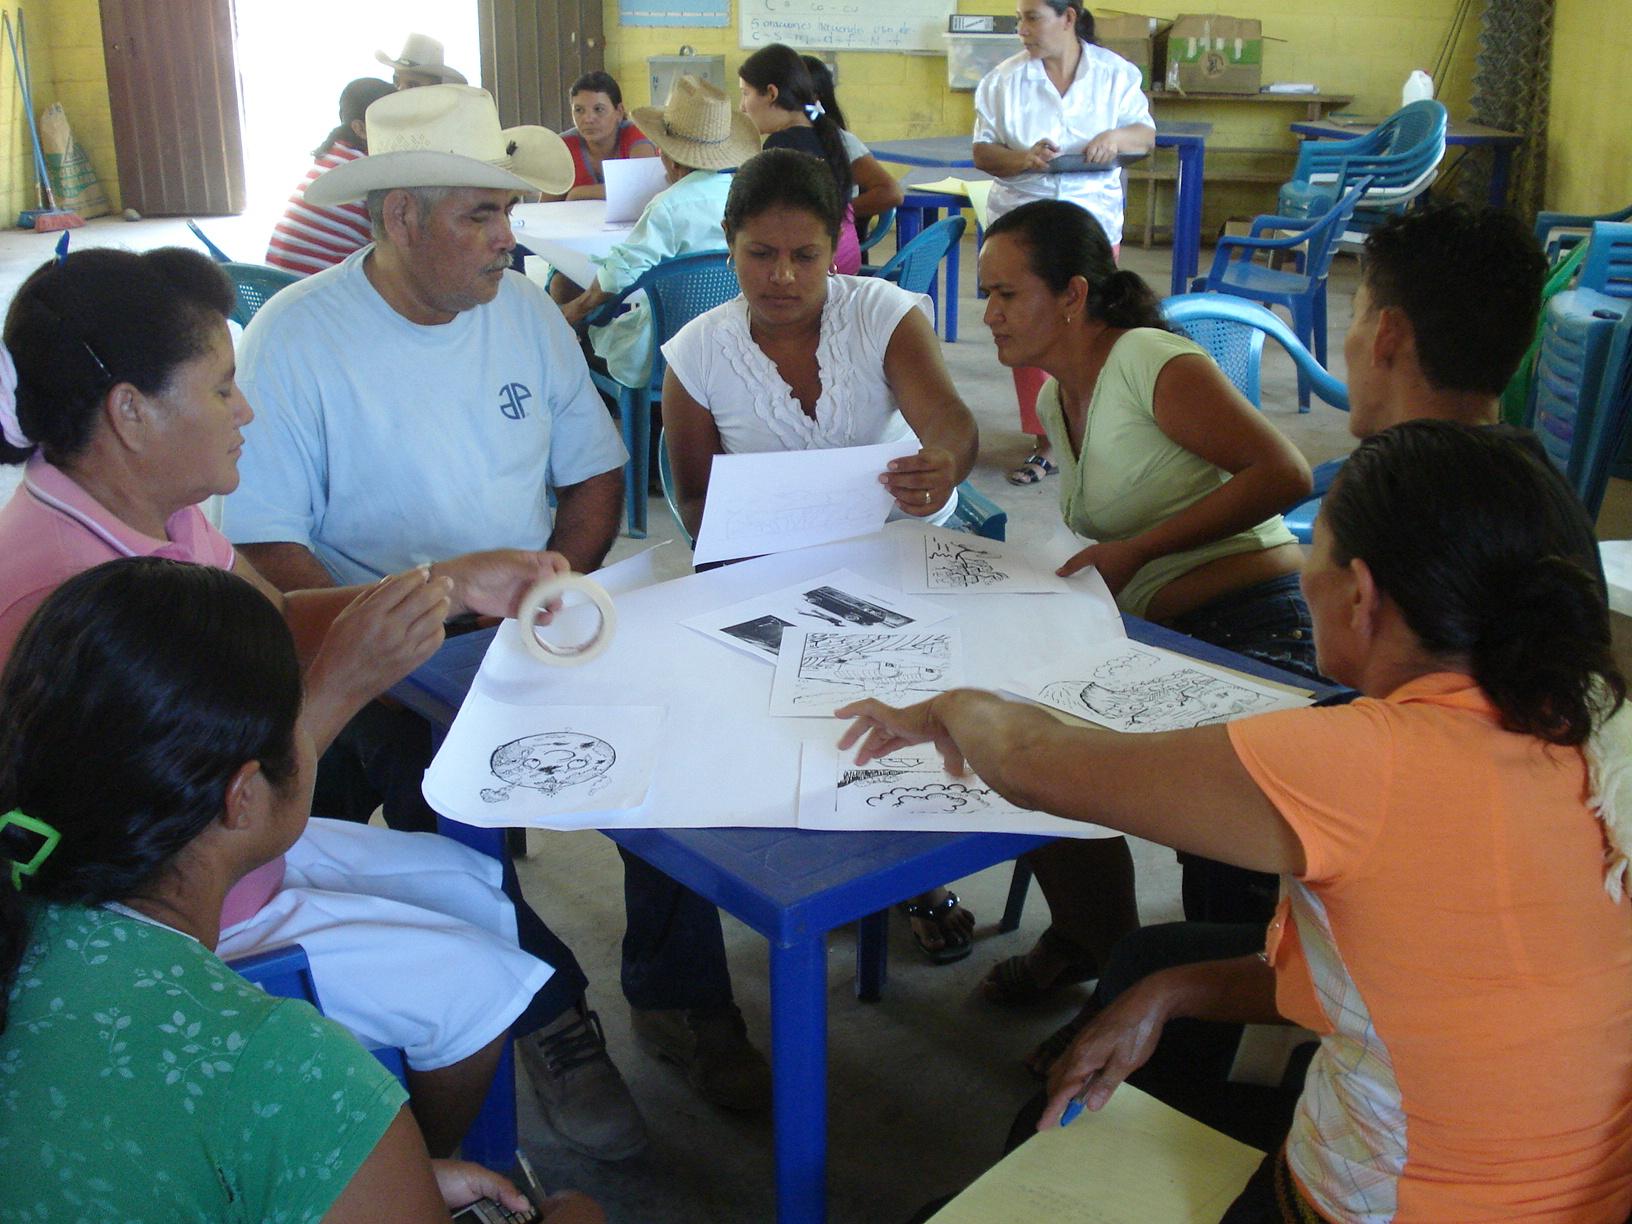 Participantes elaborando plata